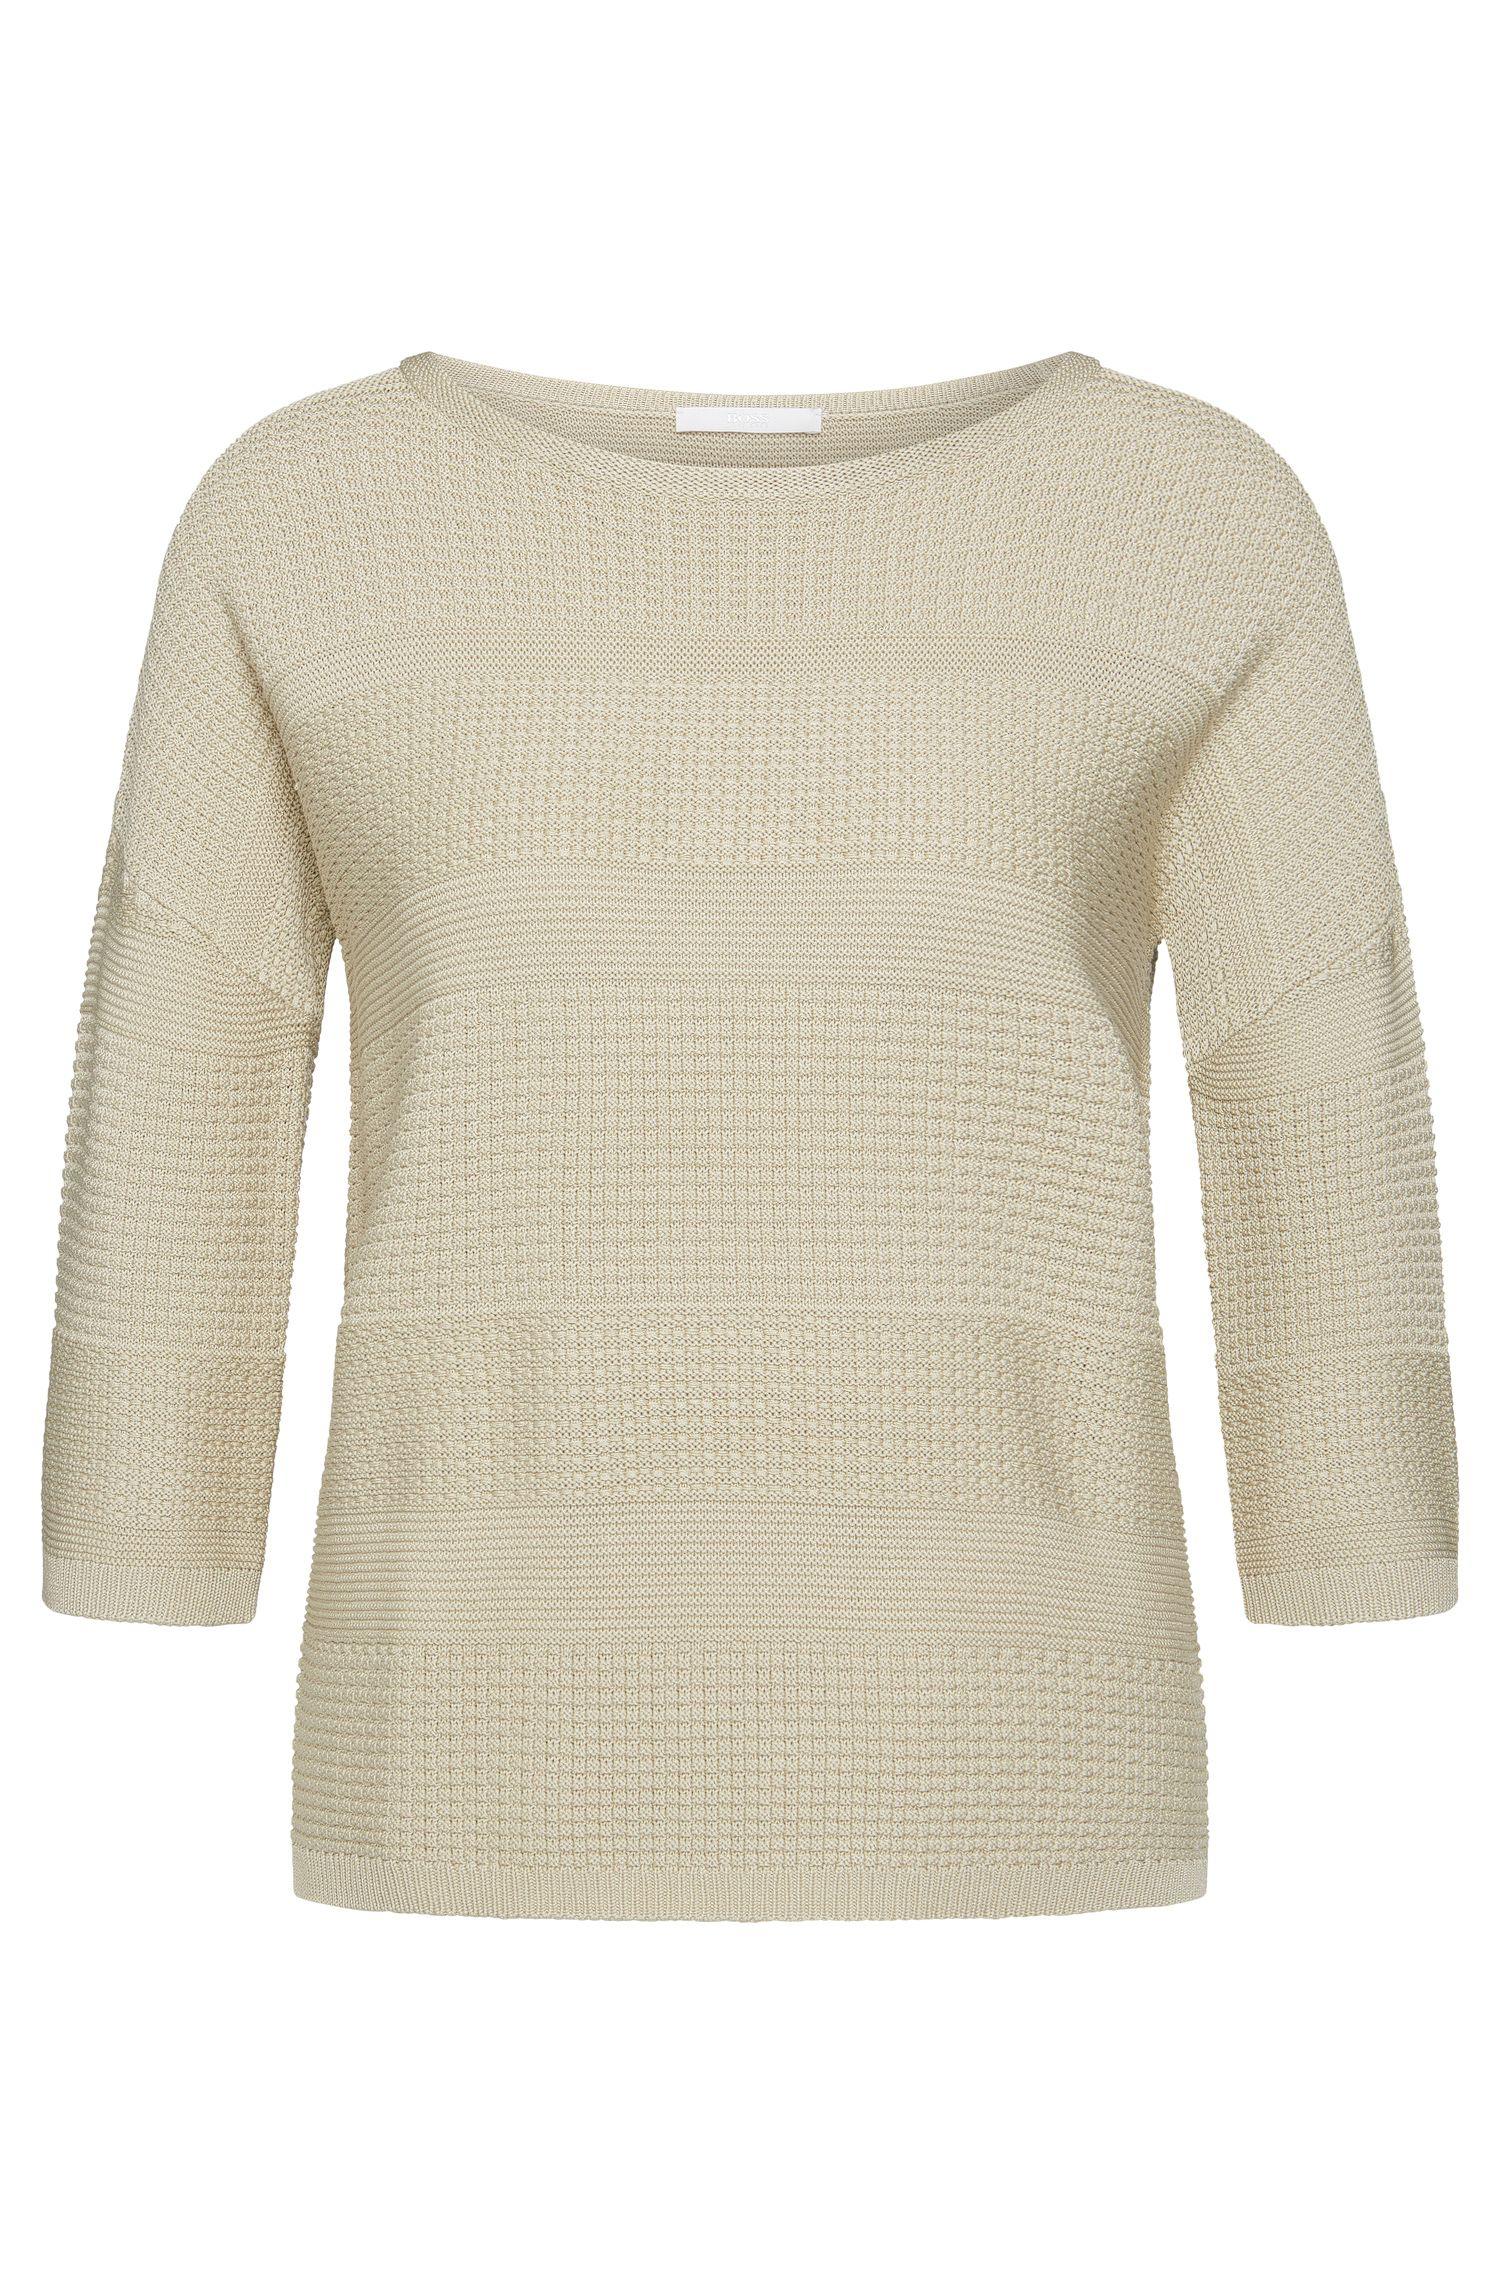 Straight-cut sweater in viscose blend with cotton: 'Fiammetta'